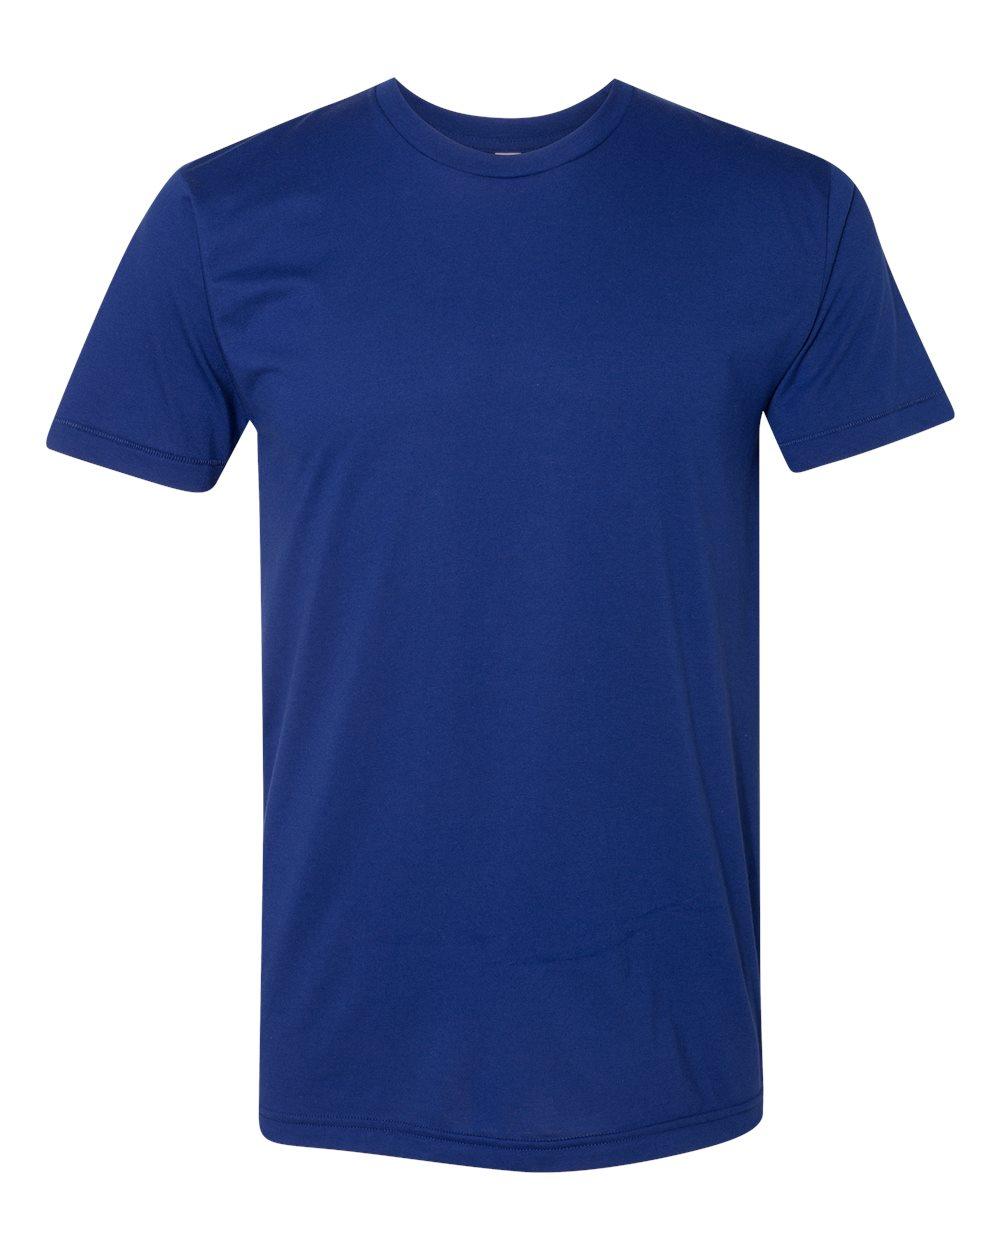 American-Apparel-Mens-Slim-Fit-50-50-Cotton-T-Shirt-Tee-BB401W-up-to-2XL thumbnail 39